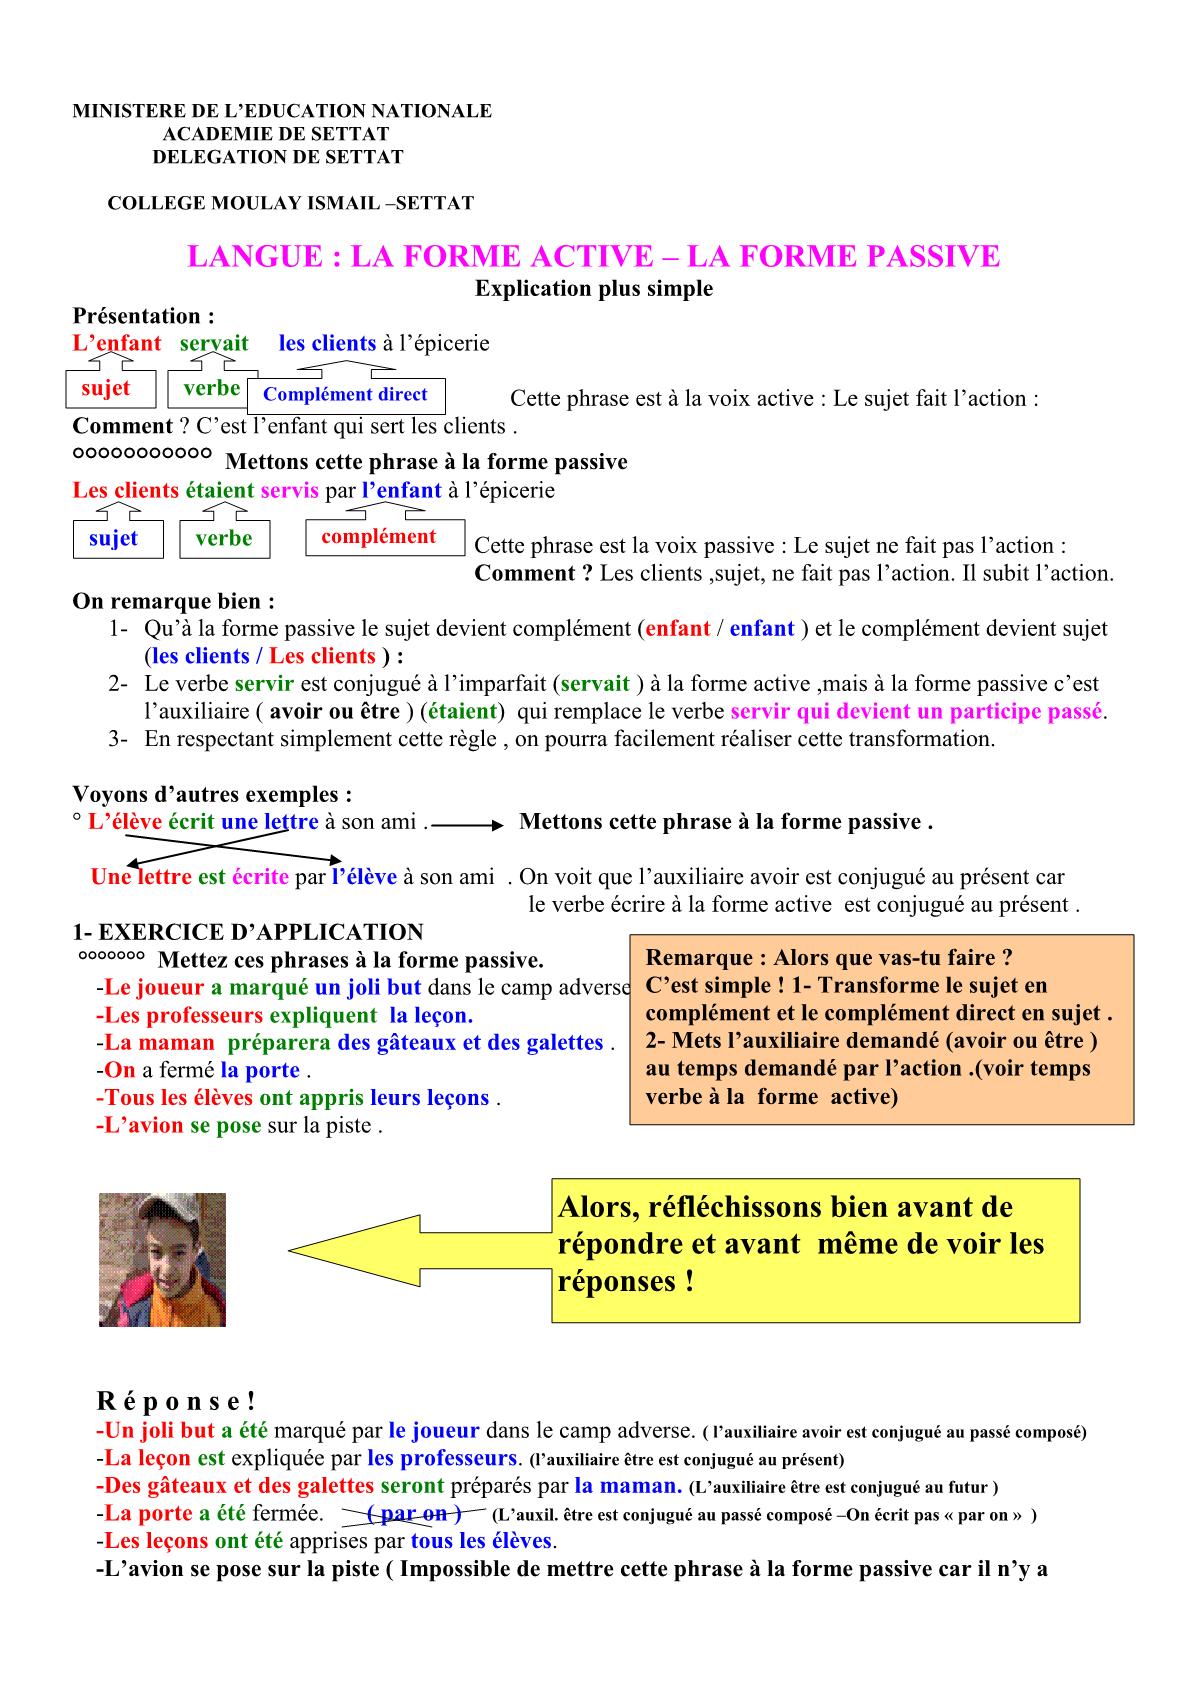 ملخص درس Voix active et voix passive الثانية اعدادي